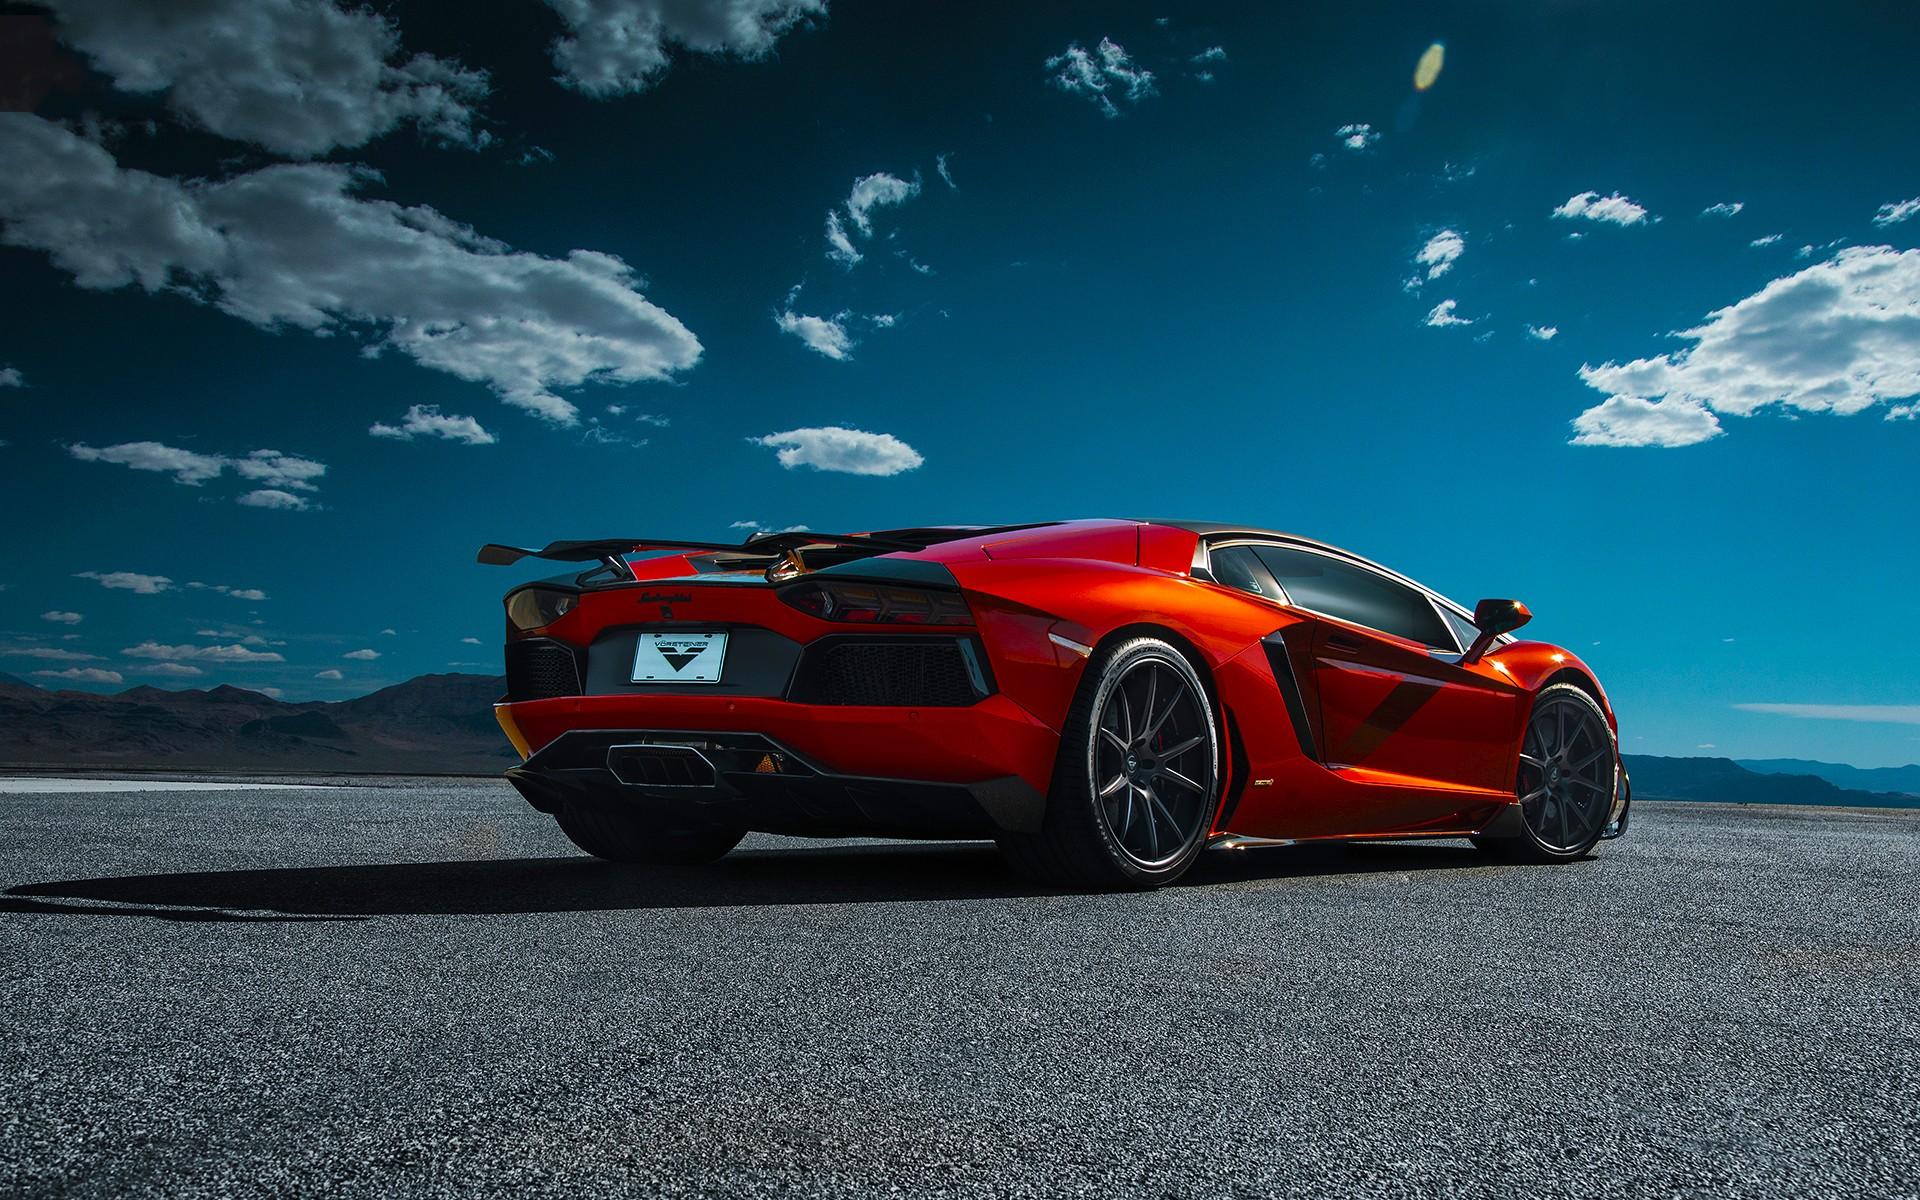 Fondos De Vehiculos: Lamborghini Aventador Fondos De Pantalla, Fondos De